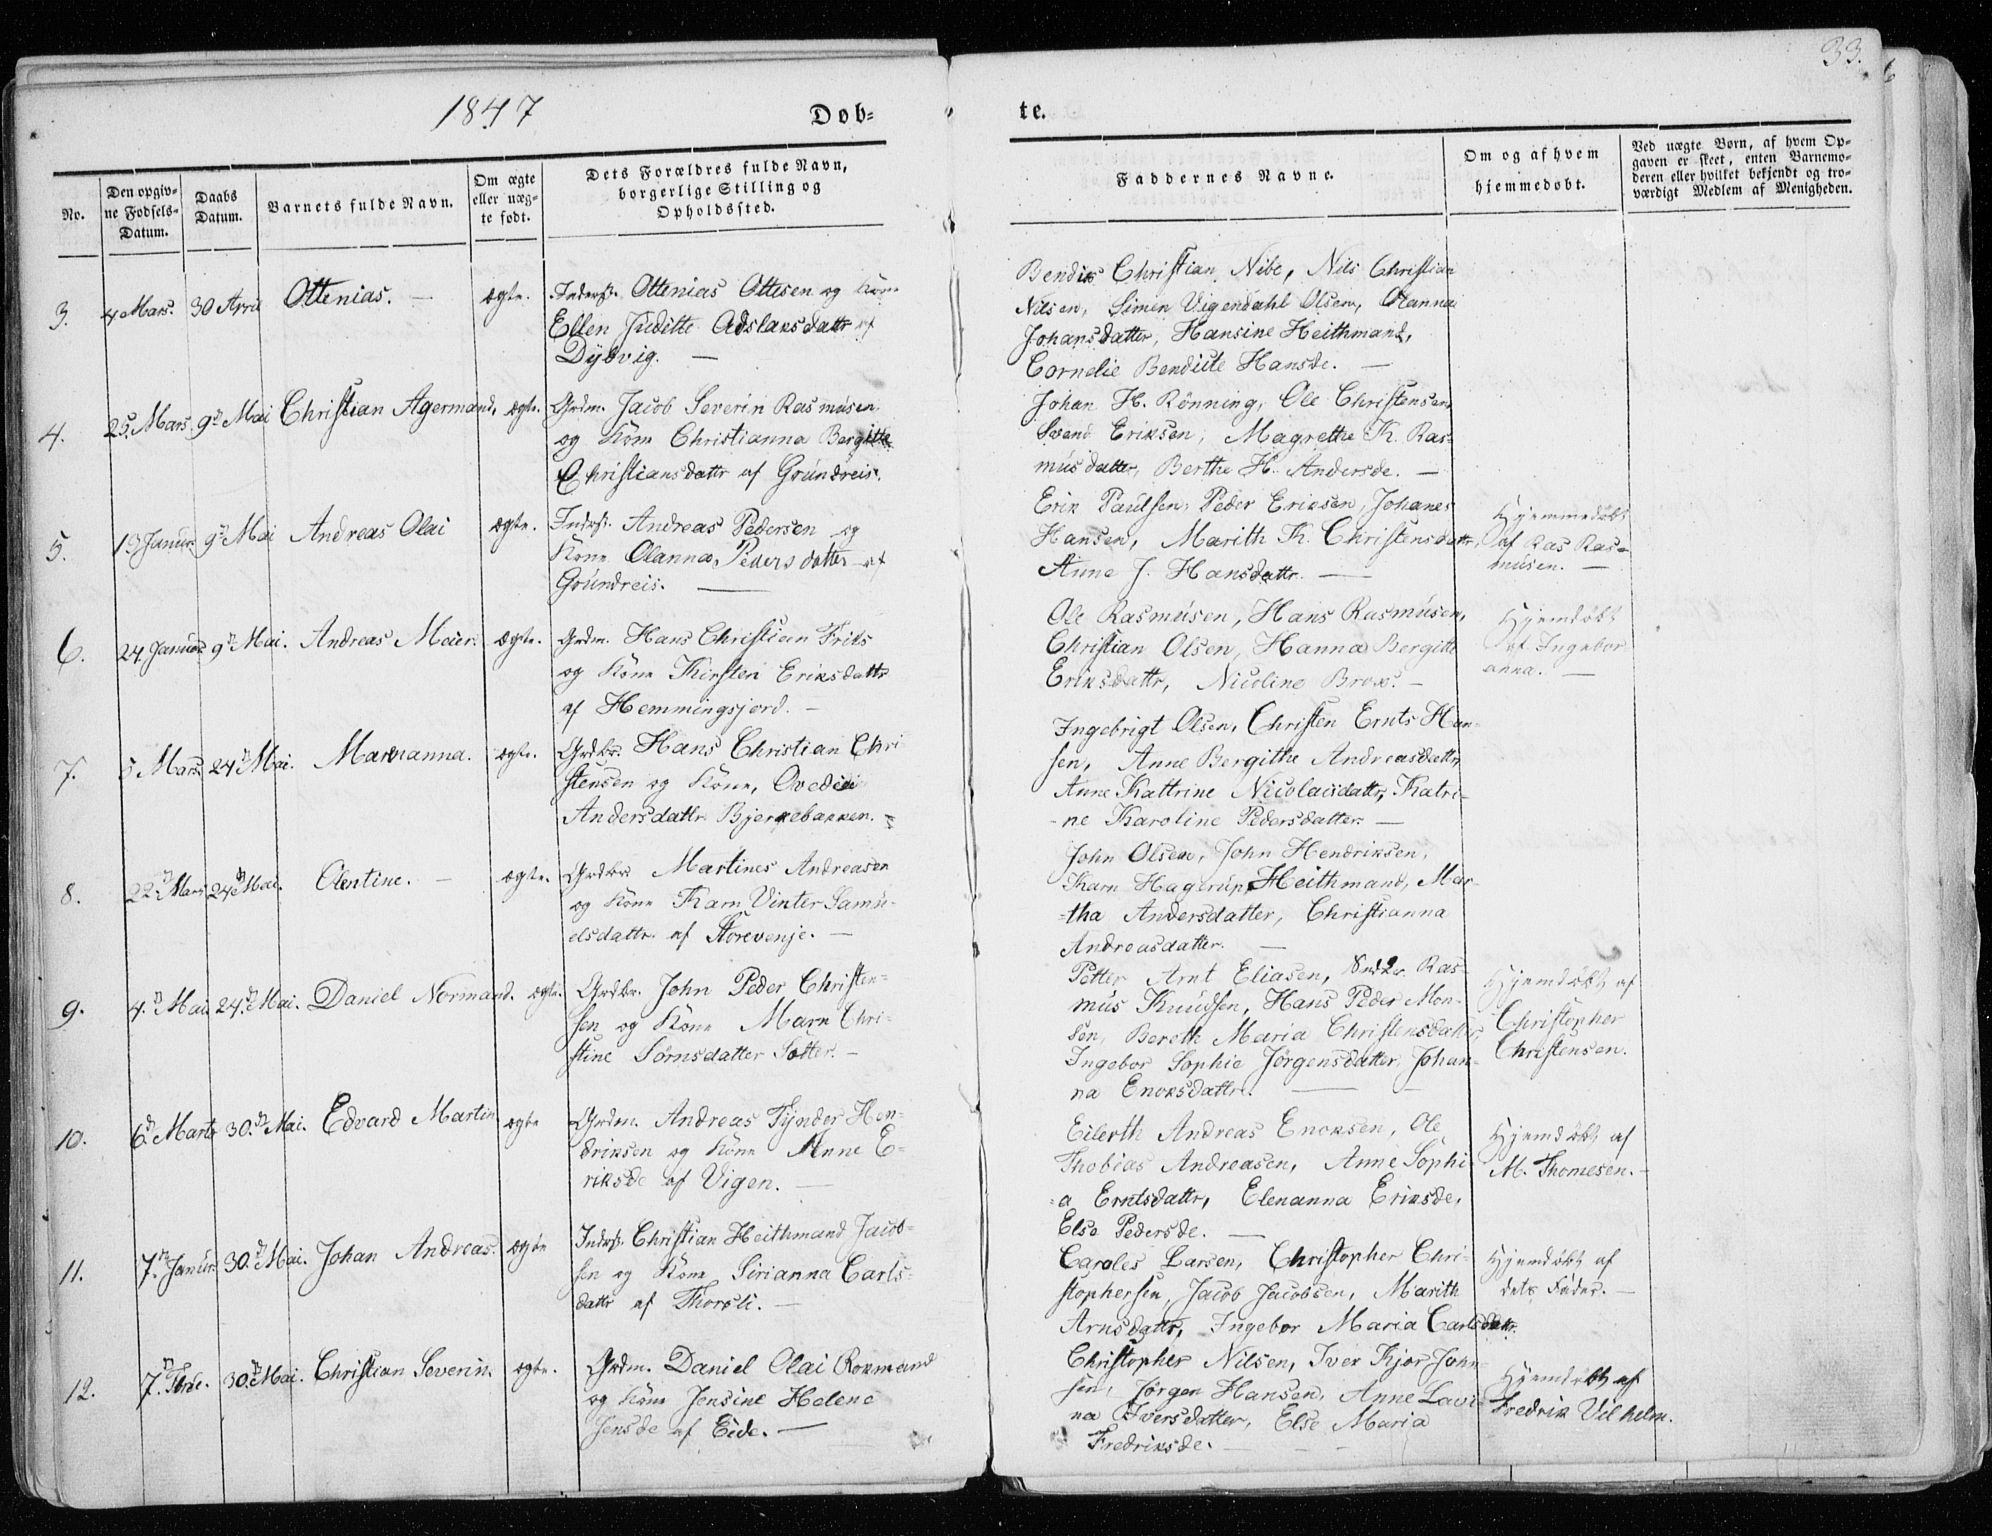 SATØ, Tranøy sokneprestkontor, I/Ia/Iaa/L0006kirke: Ministerialbok nr. 6, 1844-1855, s. 33